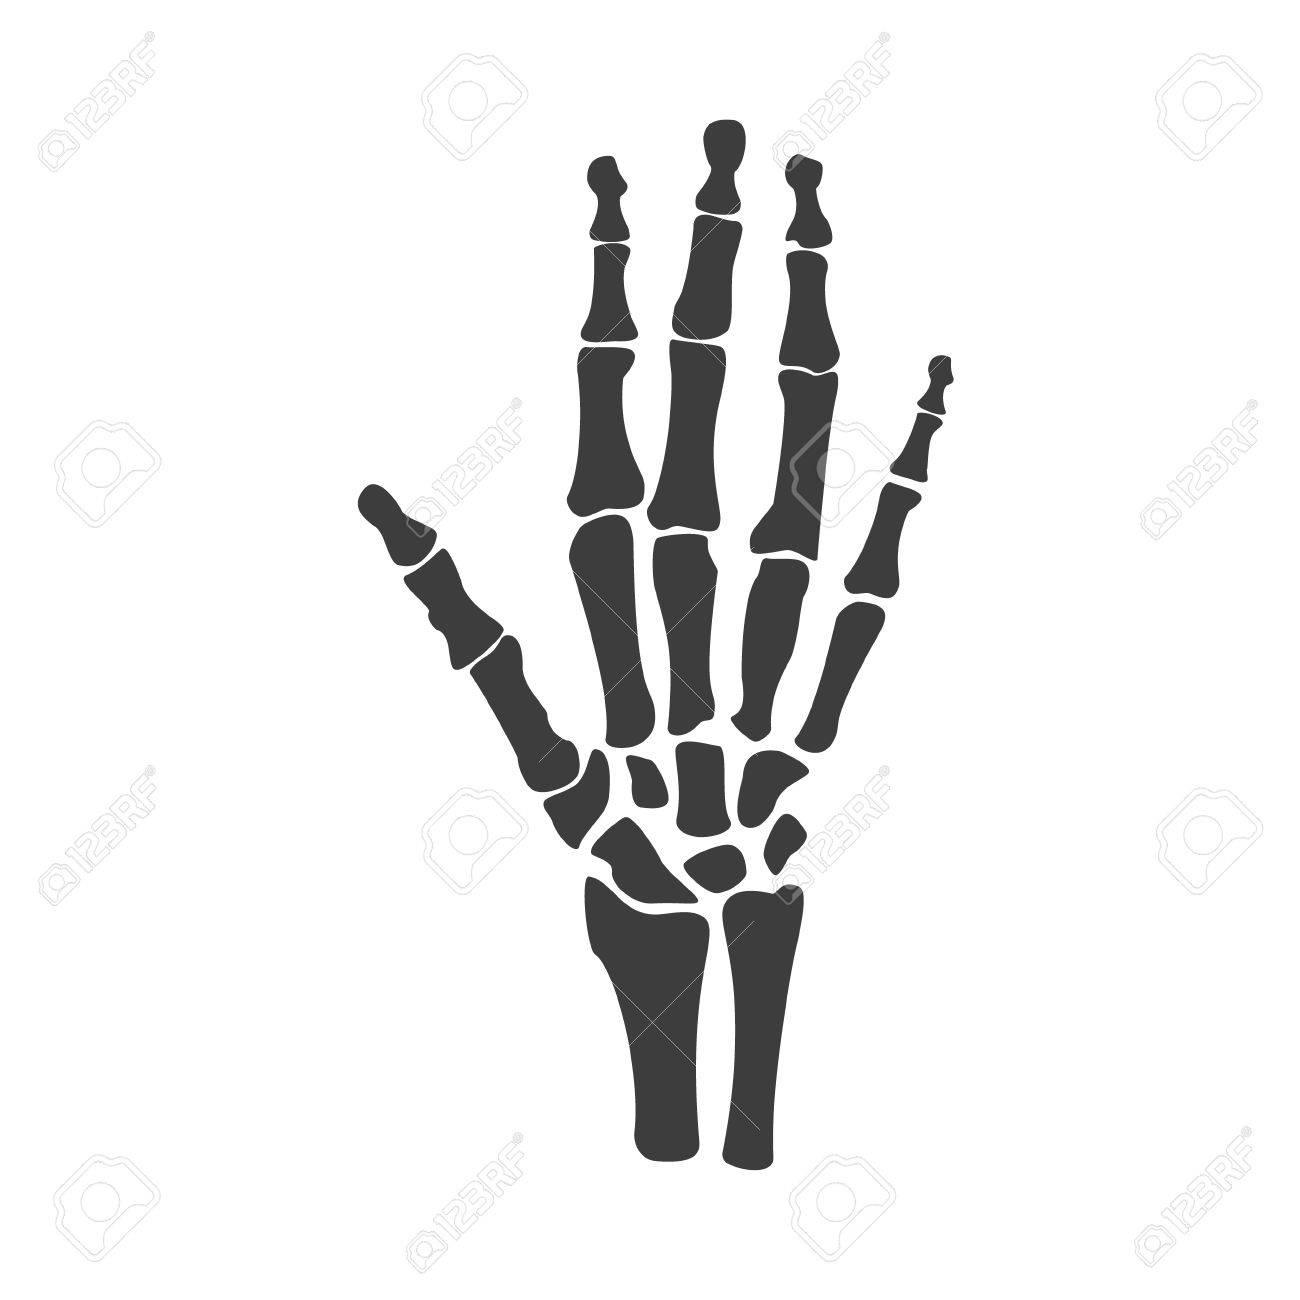 Raster Illustration Hand Bones. Orthopedic Human Hand Skeleton ...